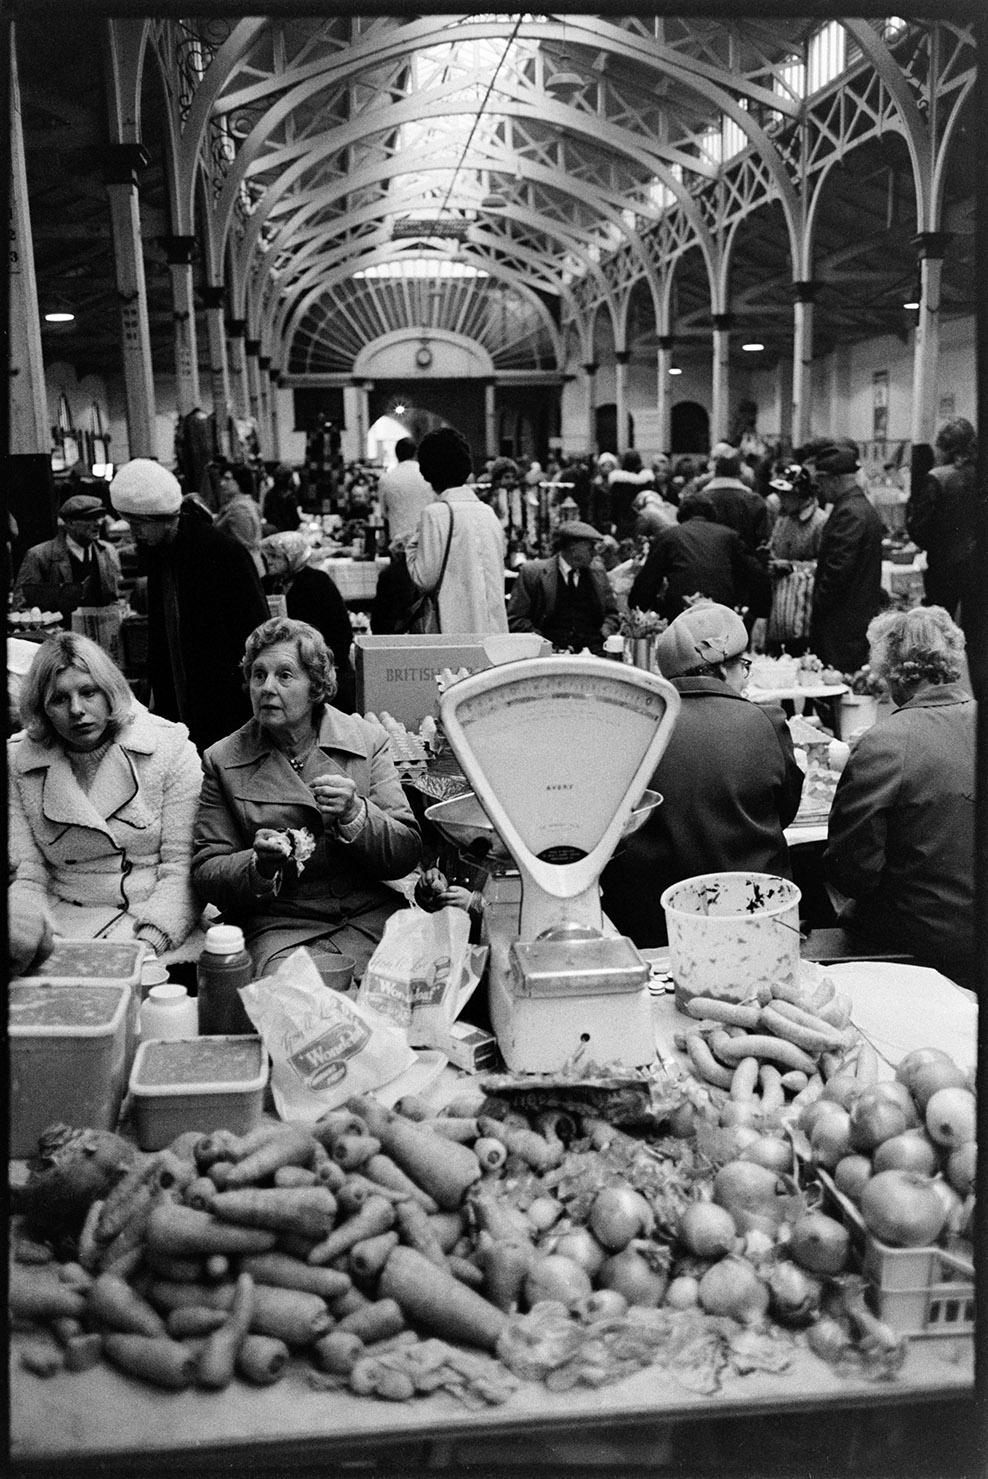 Pannier market with vegetables in foreground, Barnstaple, Pannier Market, 30 December 1973